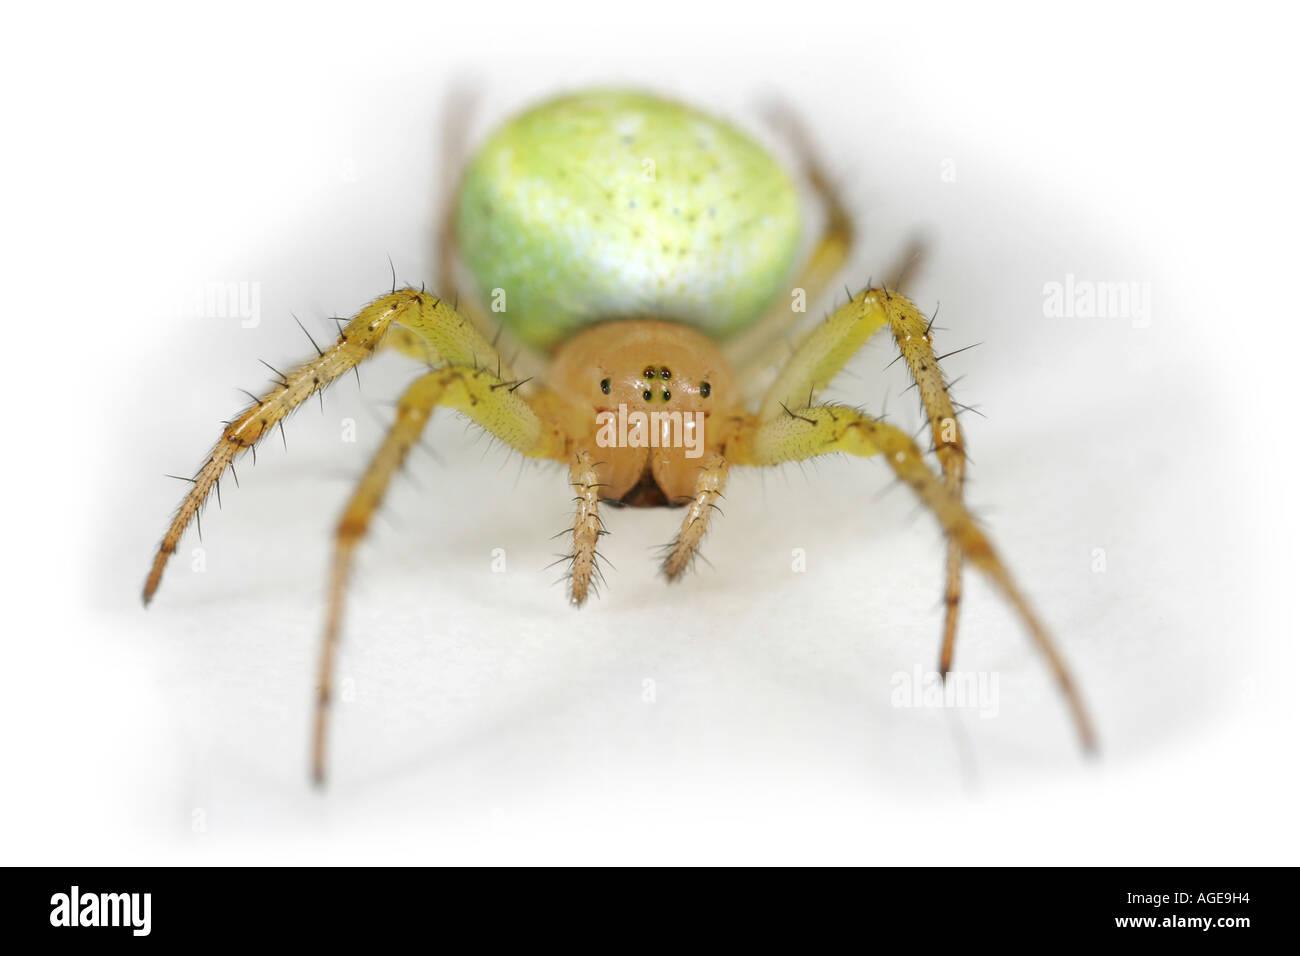 Cucumber Spider, Araniella Cucurbitina ,on white backgroundStock Photo